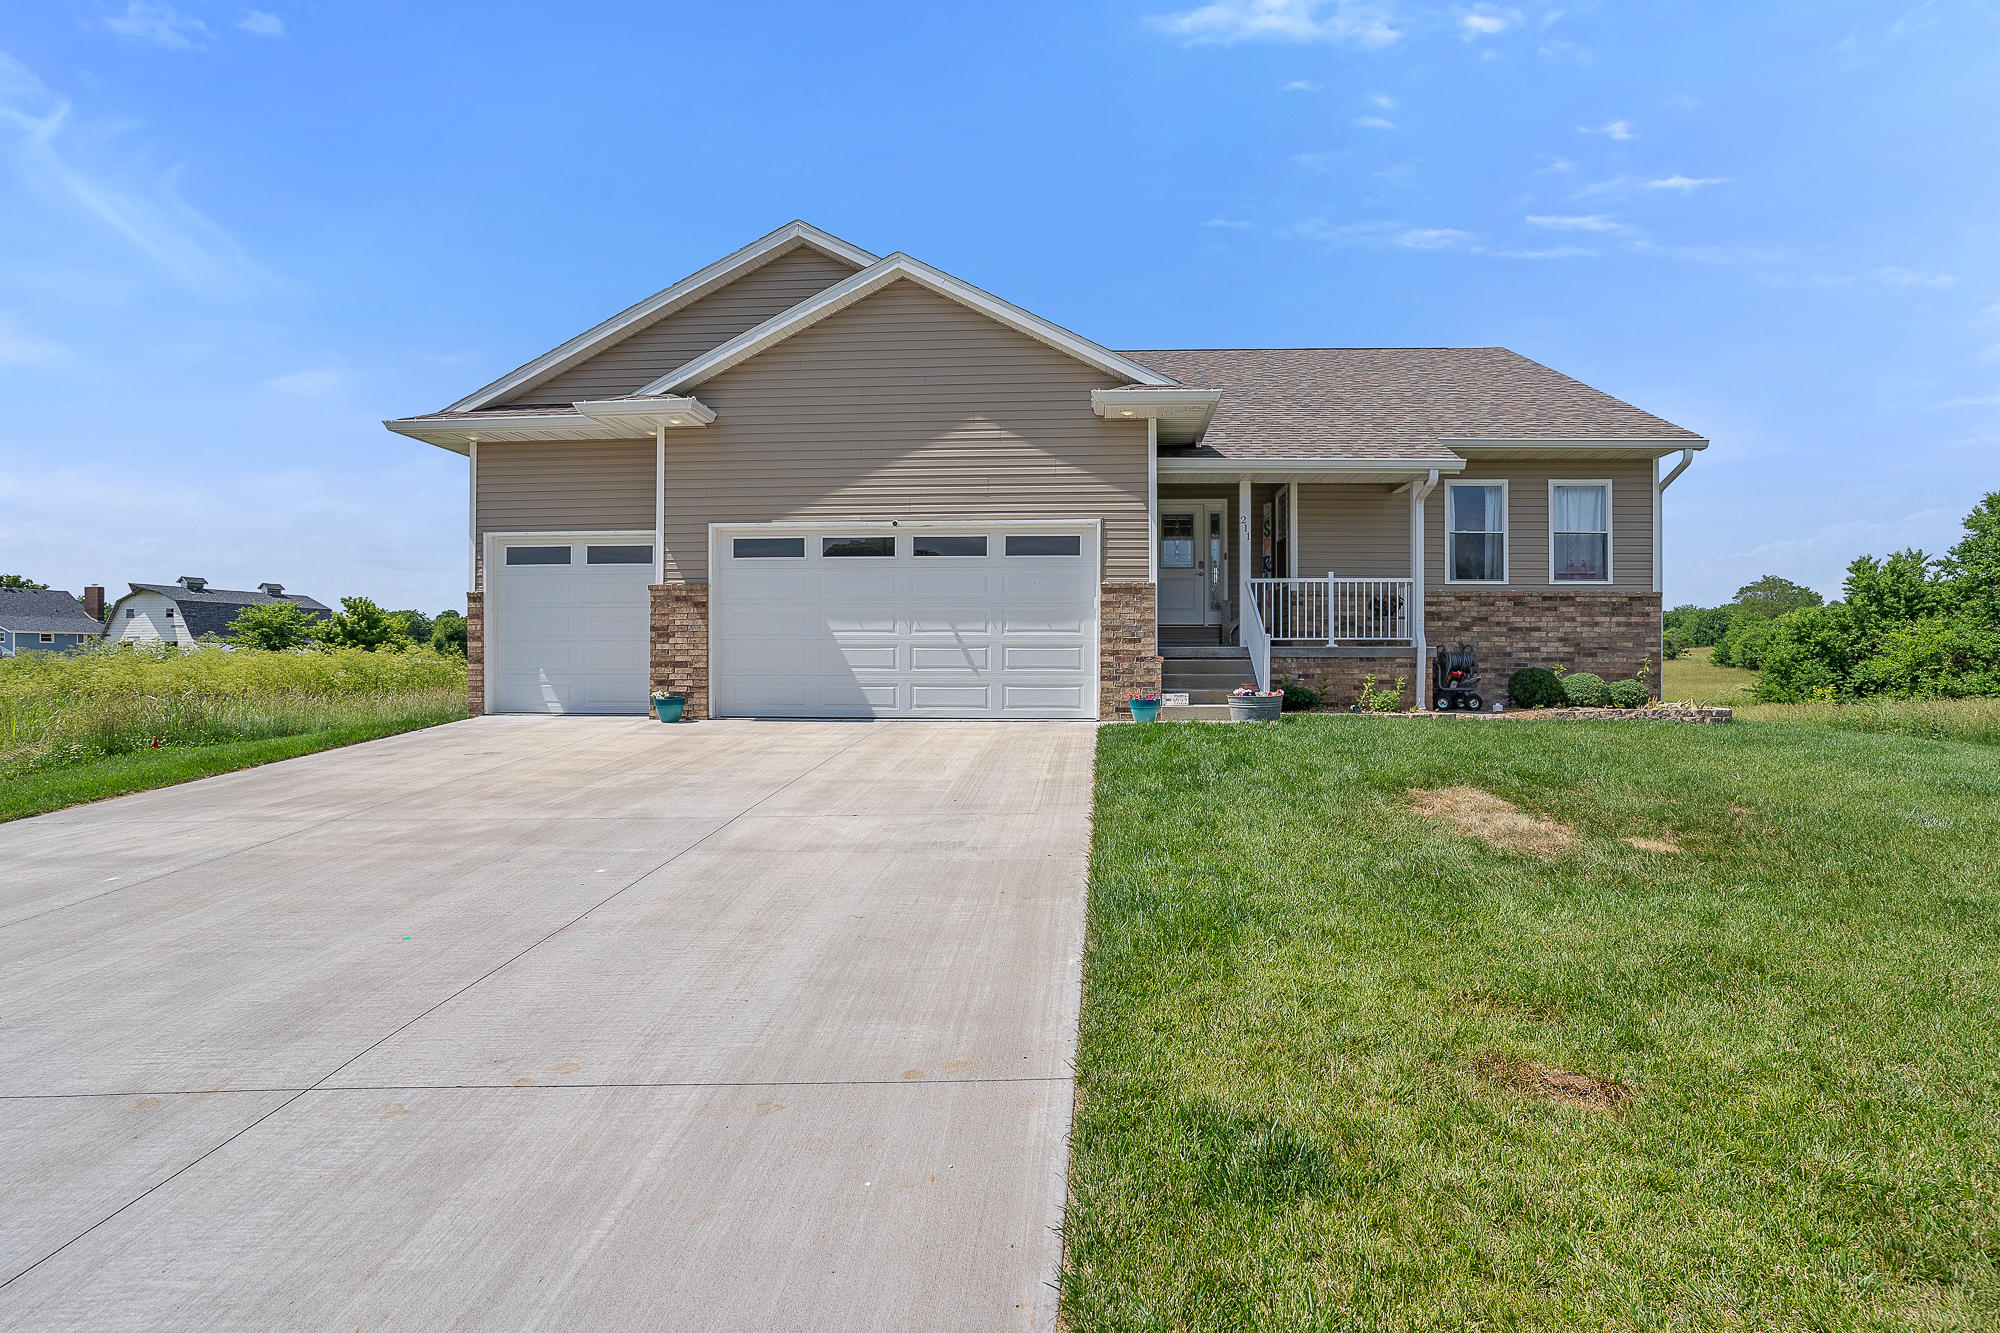 211 East Garnet Drive, Republic, Missouri 65738